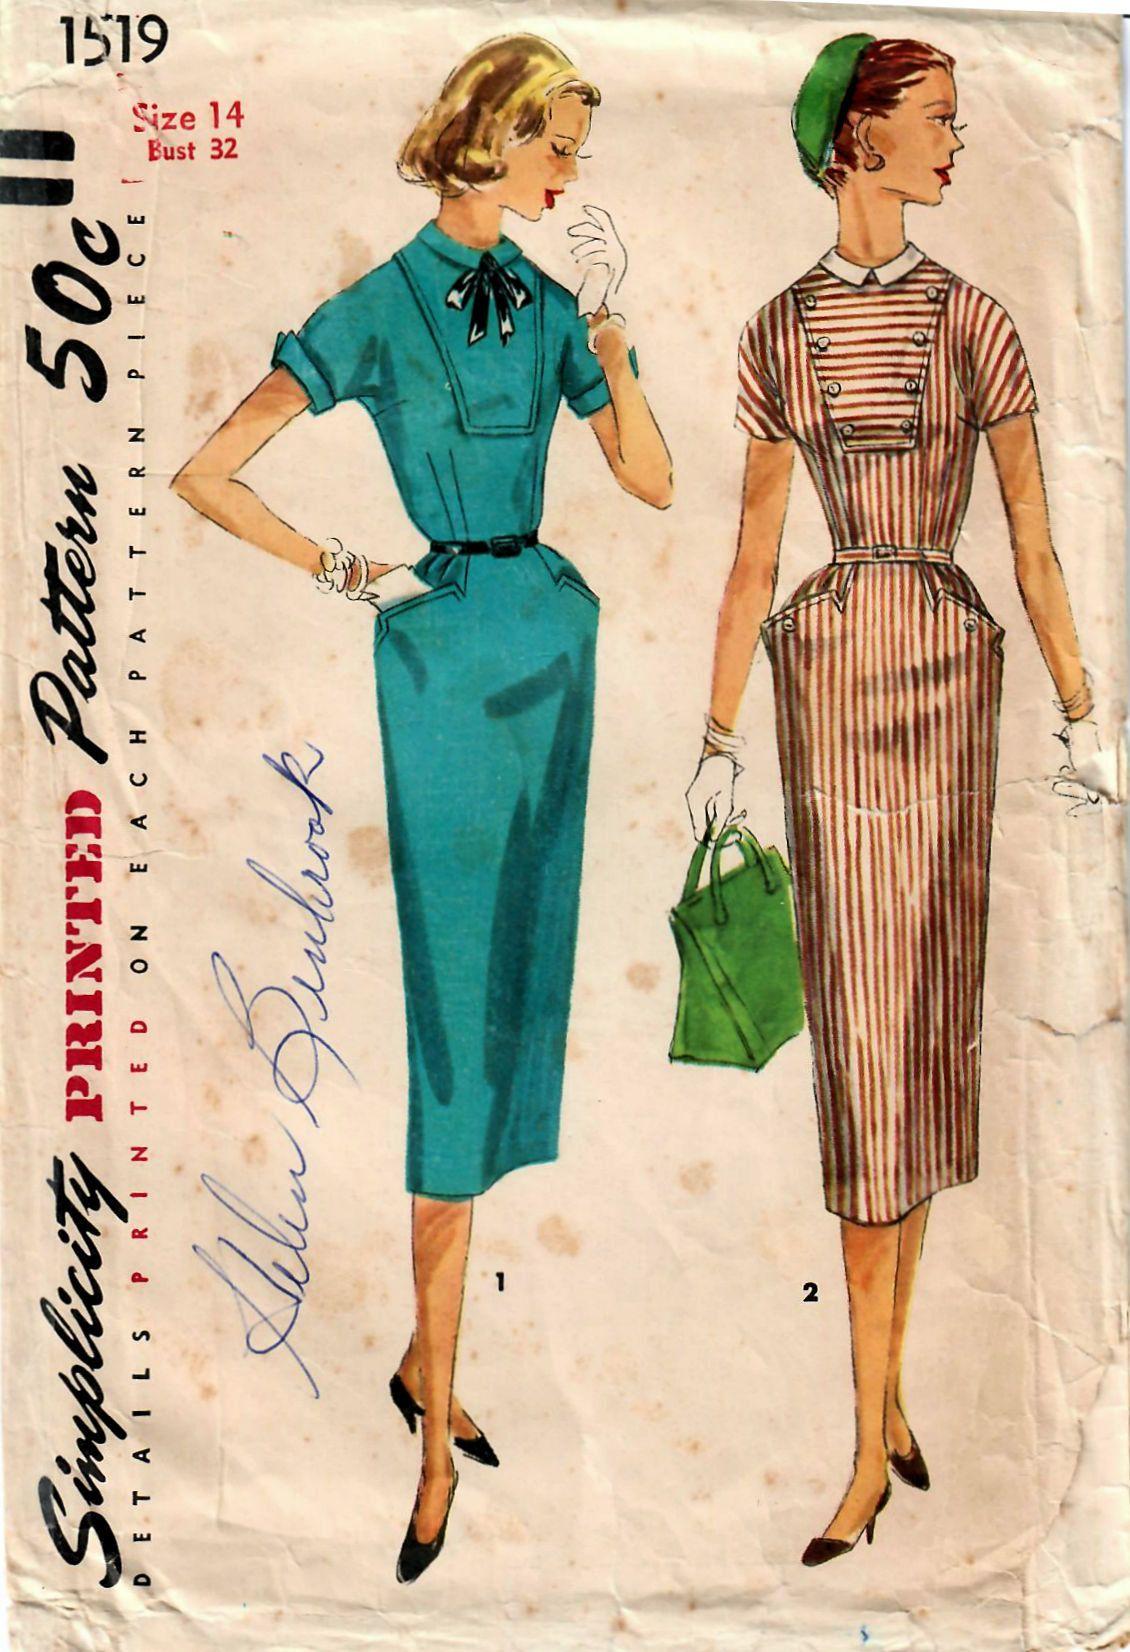 1950s Simplicity 1519 Vintage Sewing Pattern Misses Slim Dress, Sheath, Peg Top Dress, Afternoon Dress Size 14 Bust 32 by midvalecottage on Etsy